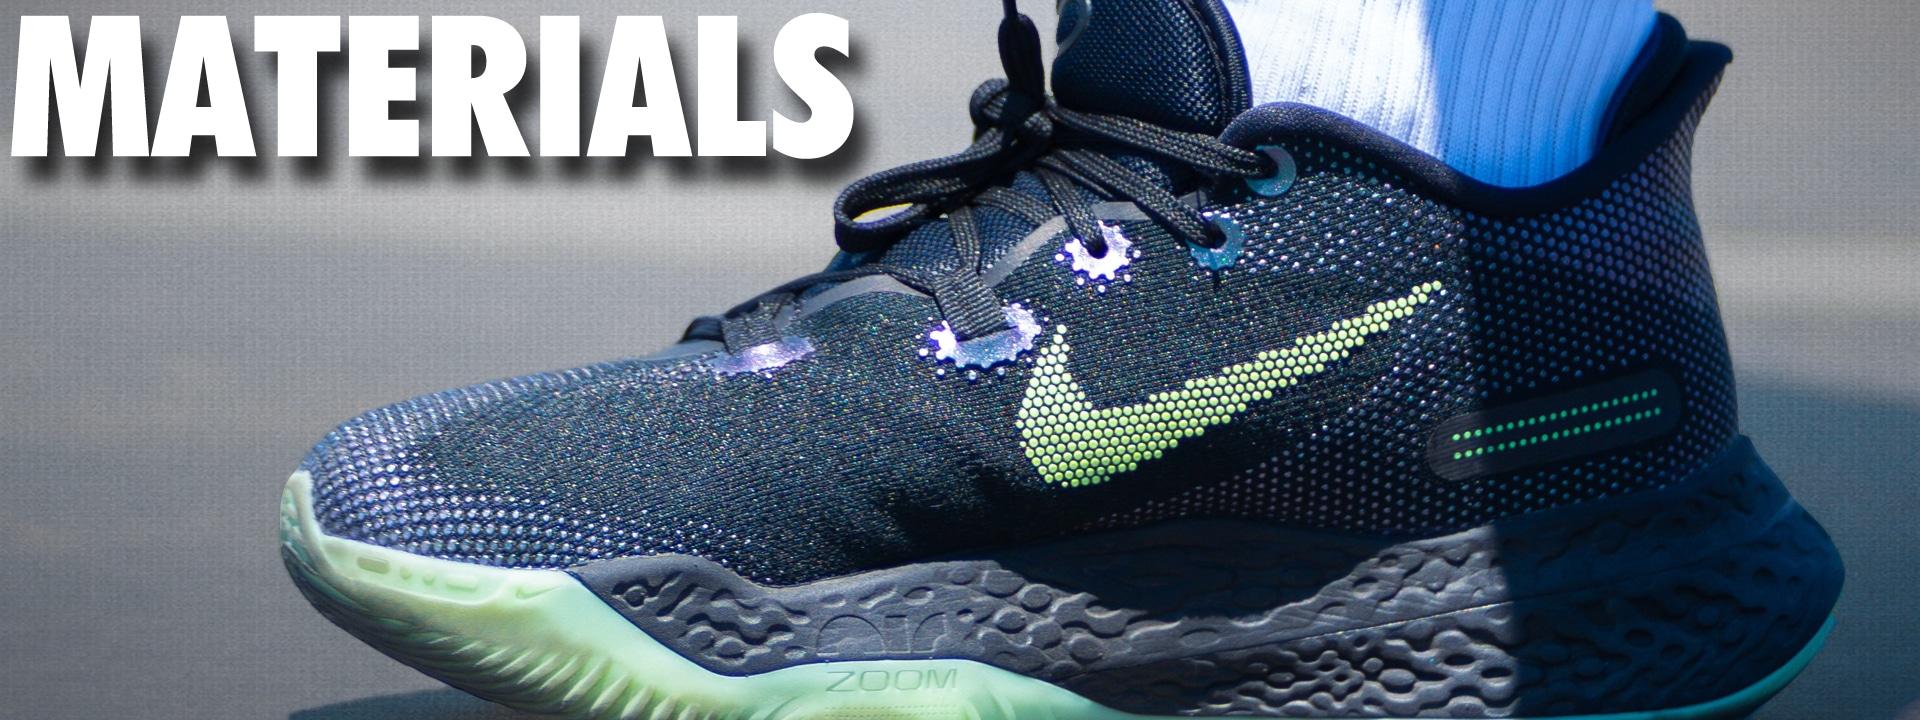 Nike Zoom BB NXT Materials